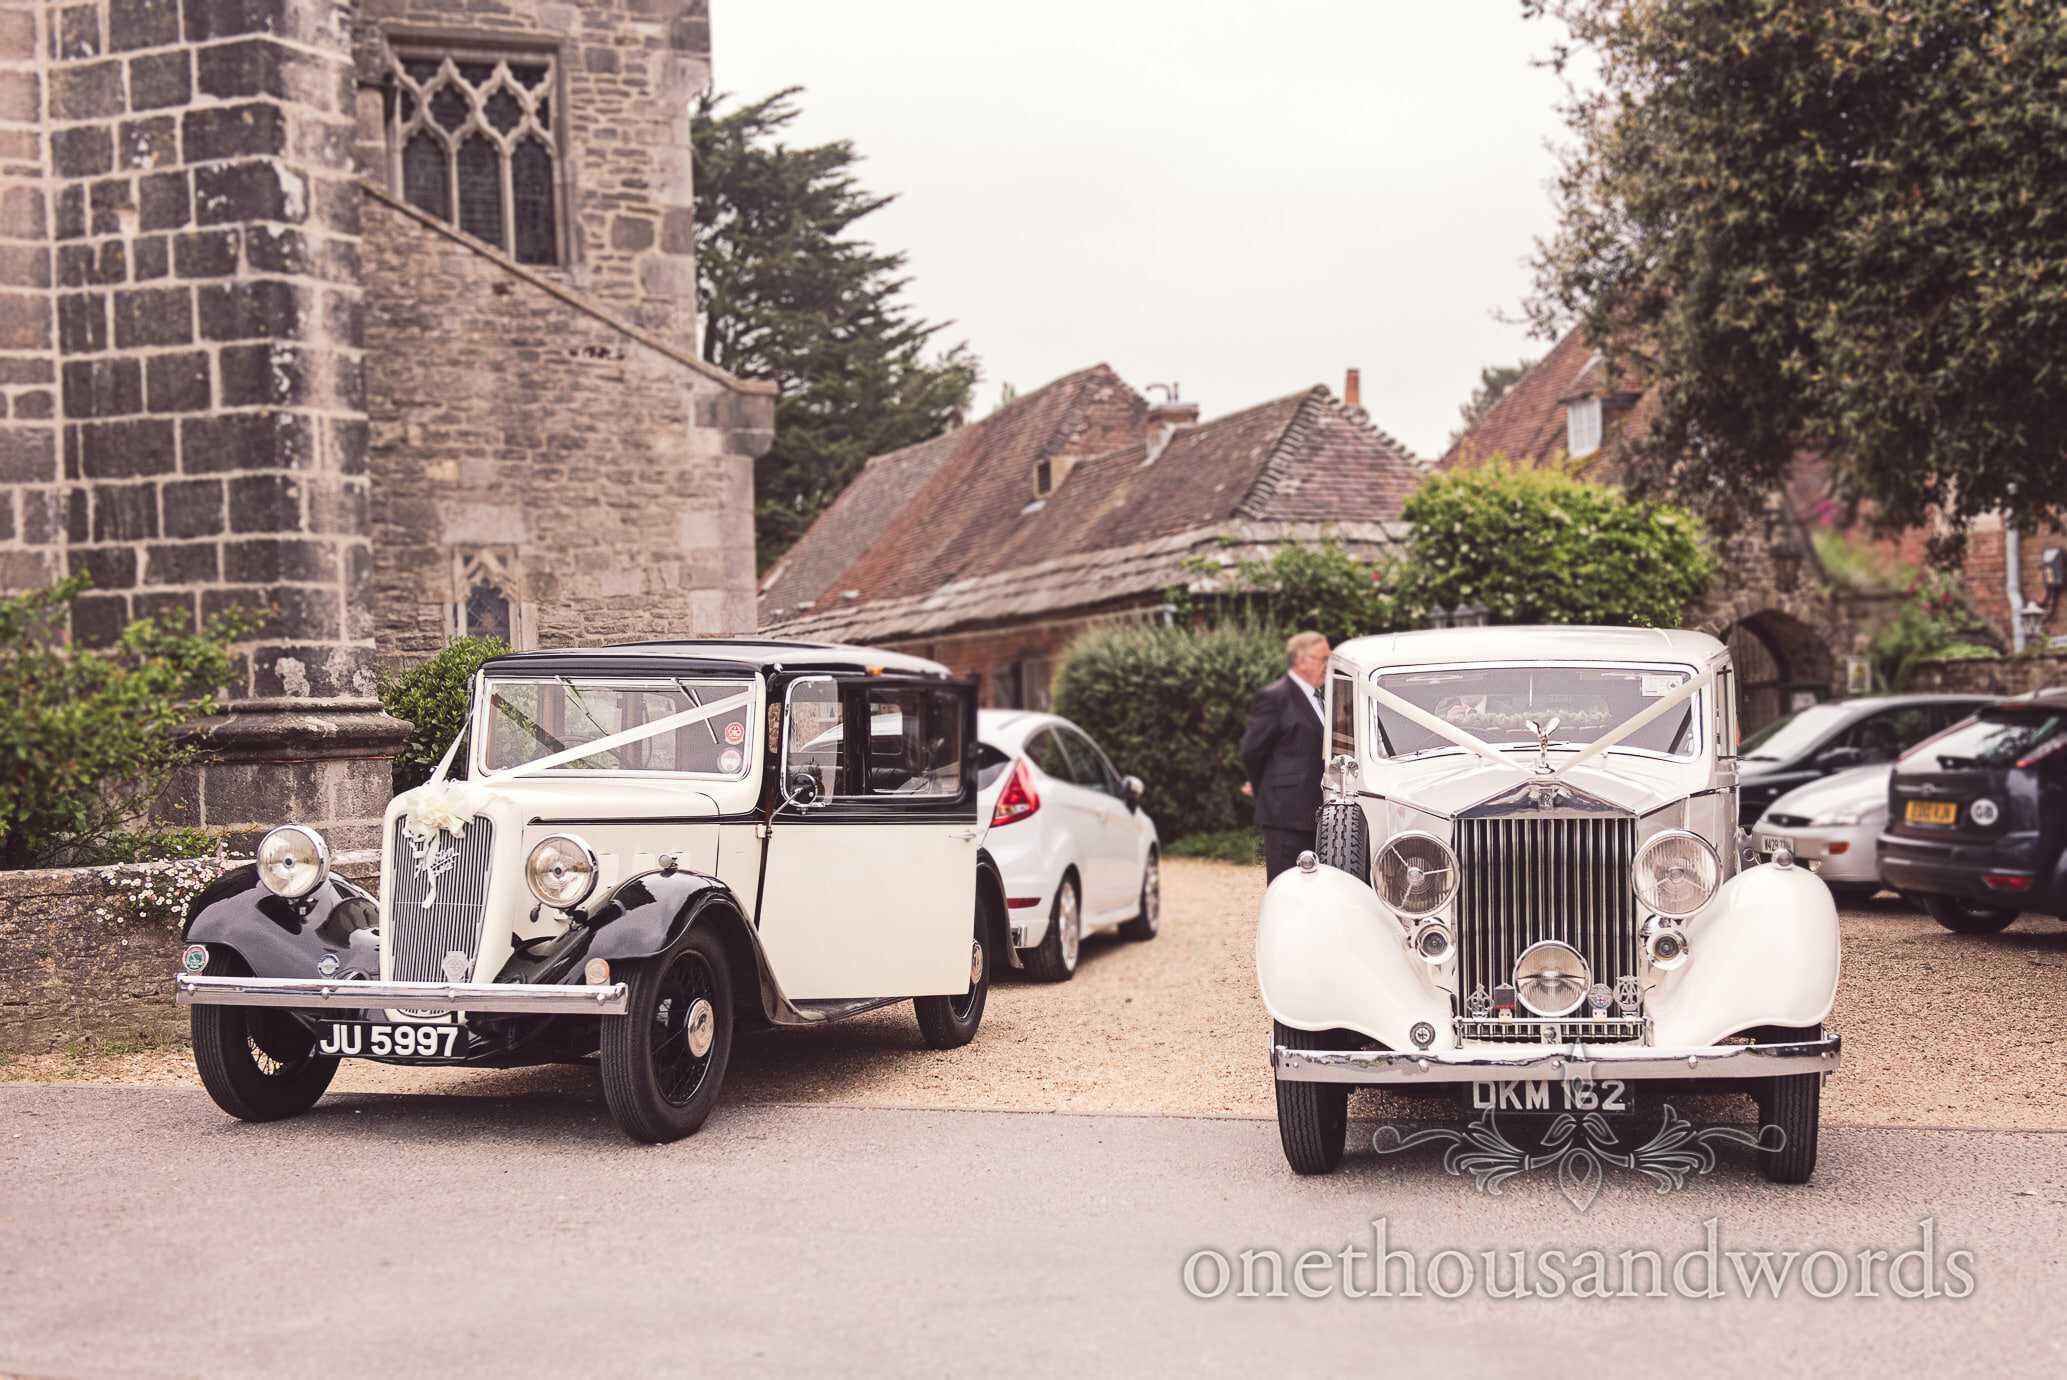 Classic wedding cars outside Wareham church wedding in Dorset